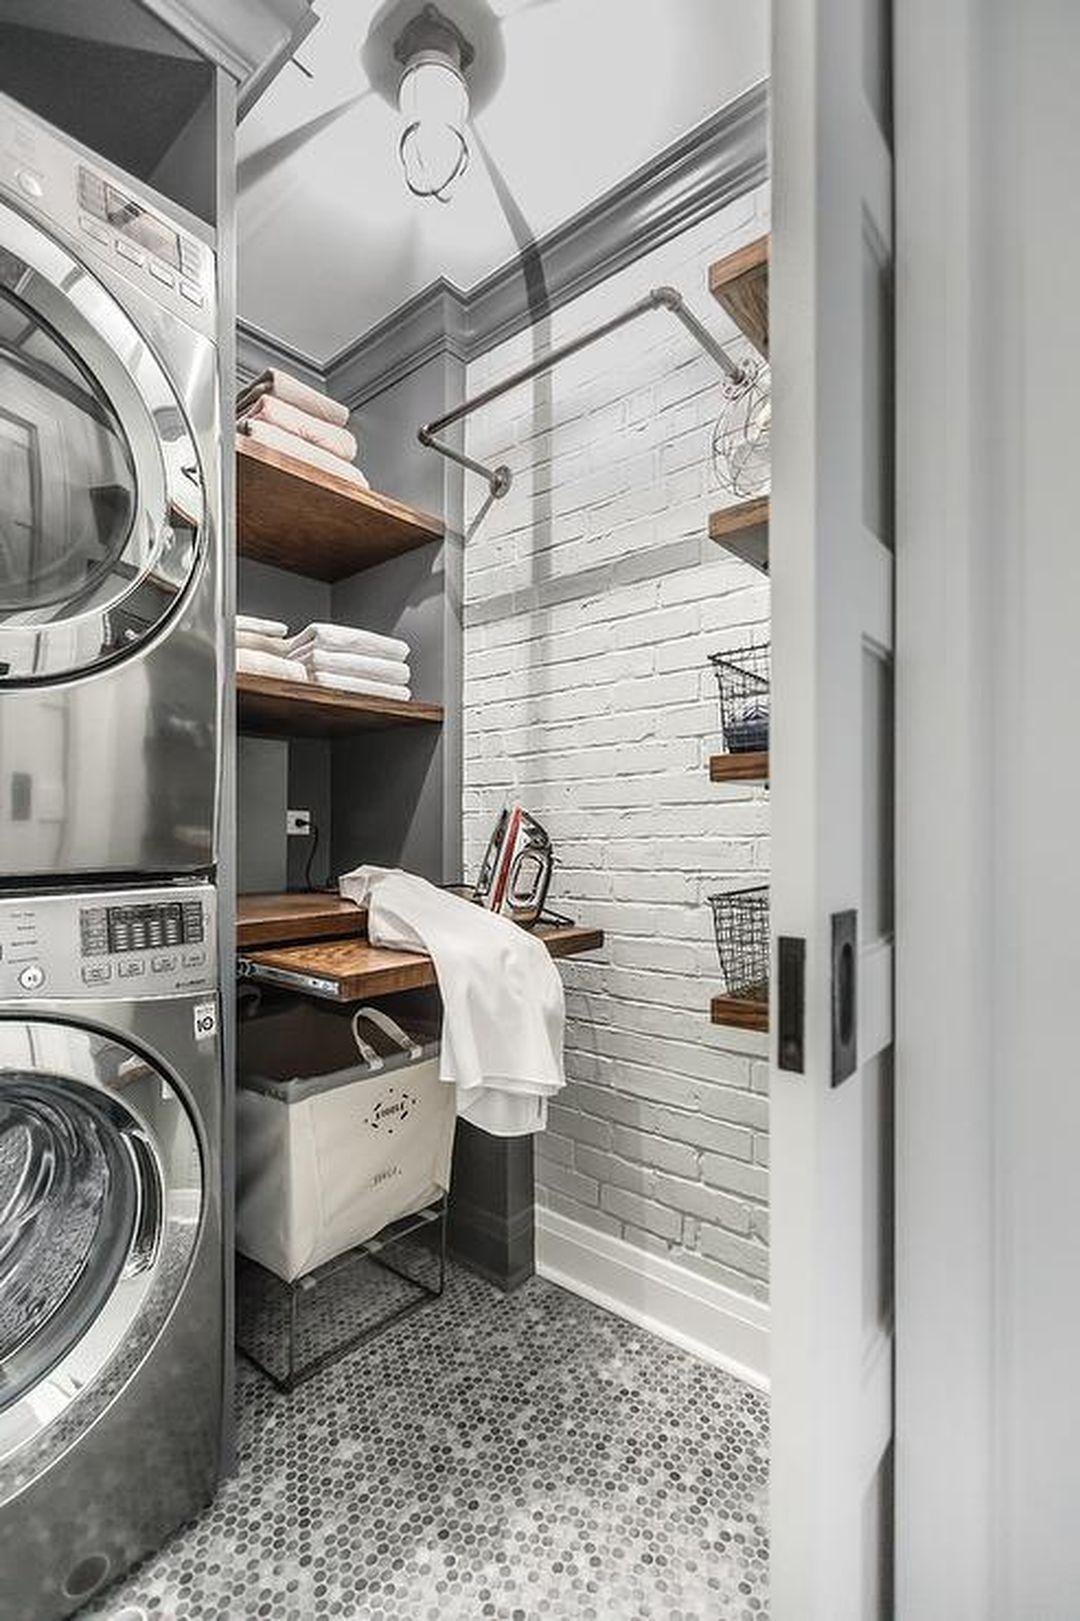 Beautiful Laundry Room Tile Design Ideas 34 Laundry Room Tile